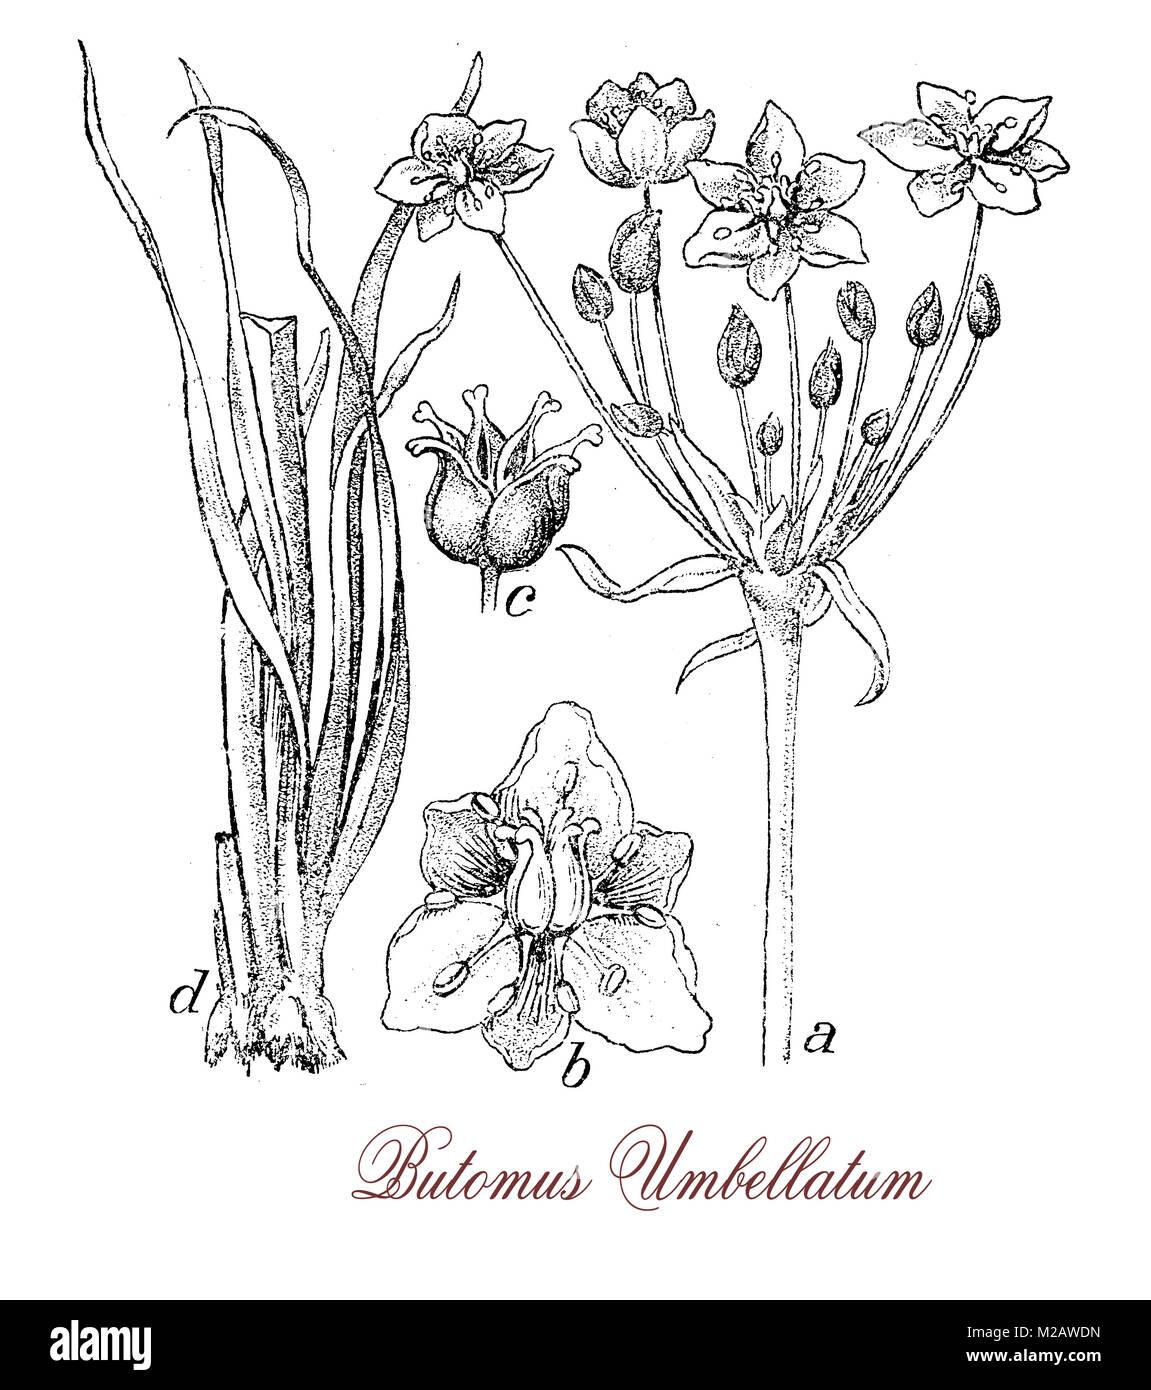 vintage engraving of butomus umbellatum, flowering aquatic plant, it grows near still waters and lakes, has swordlike - Stock Image